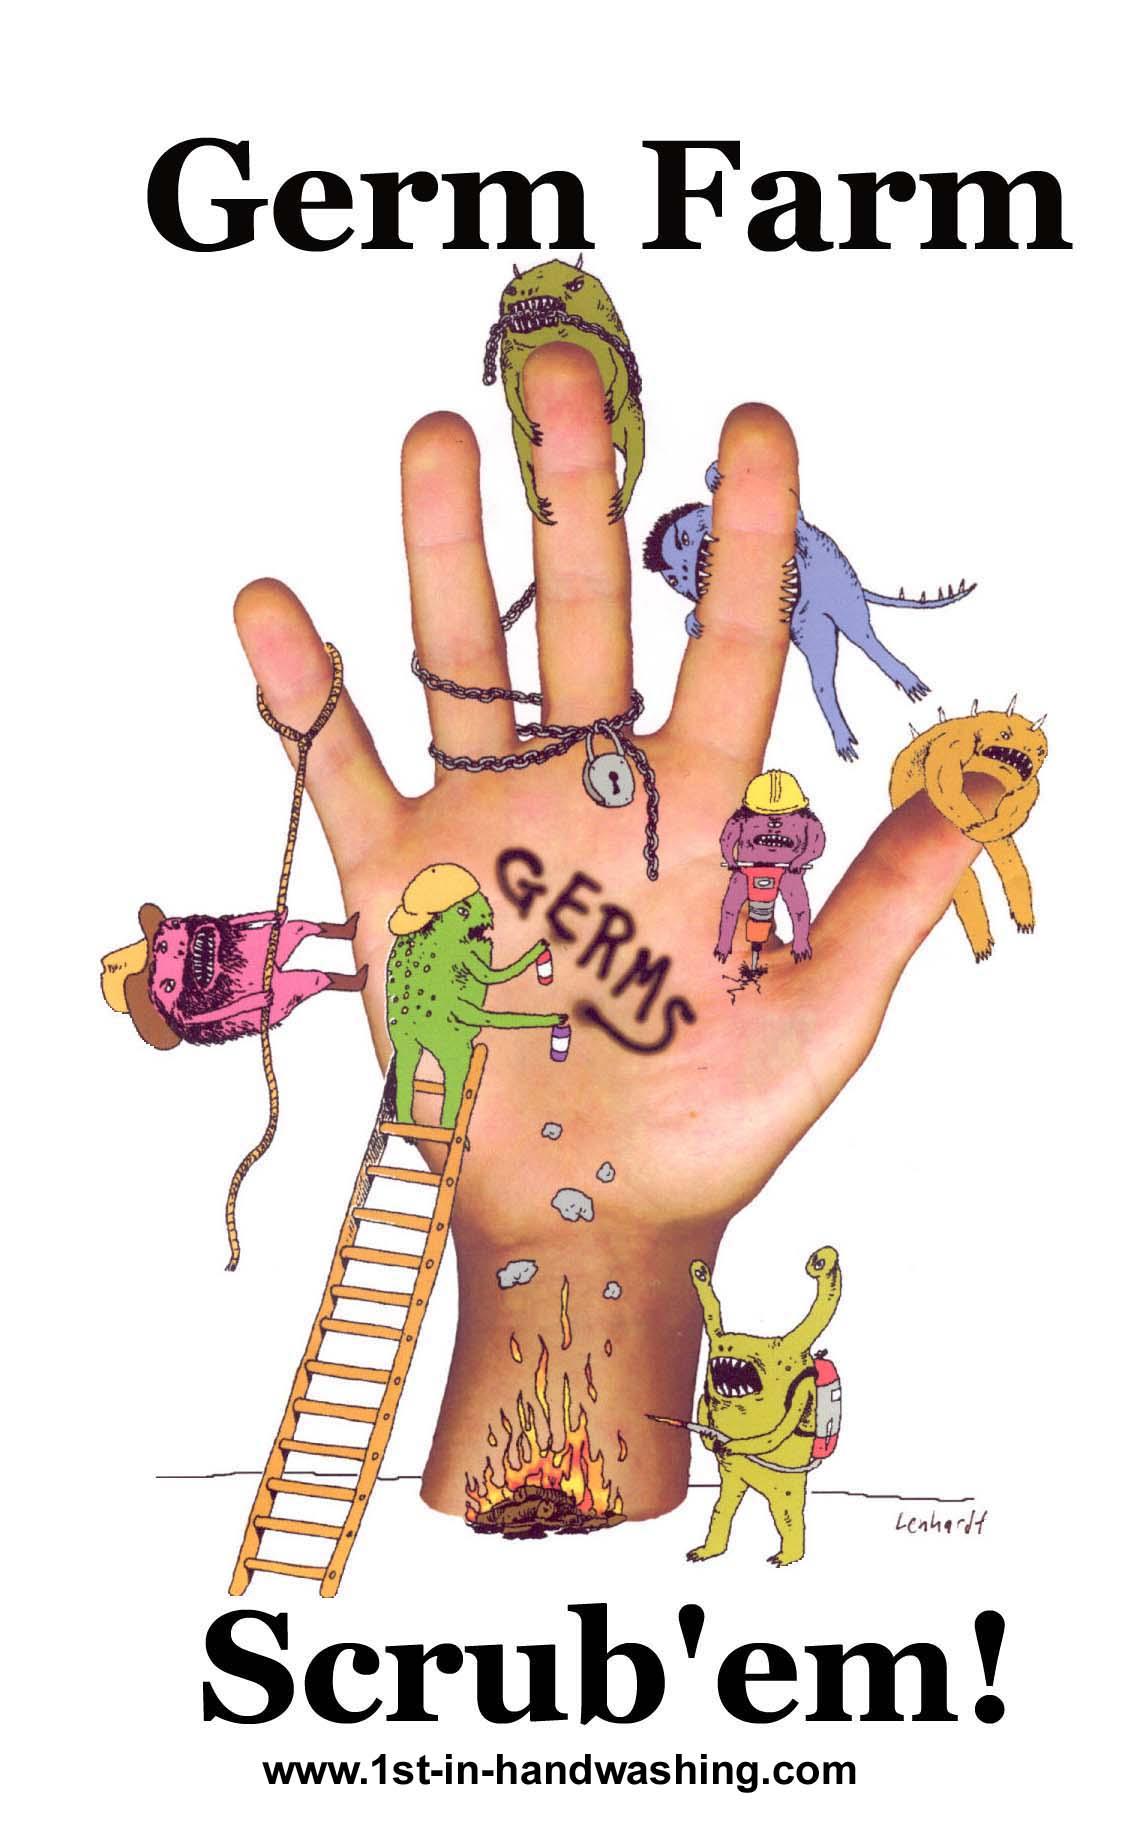 http://www.phawker.com/wp-content/uploads/2007/02/handwashing.jpg